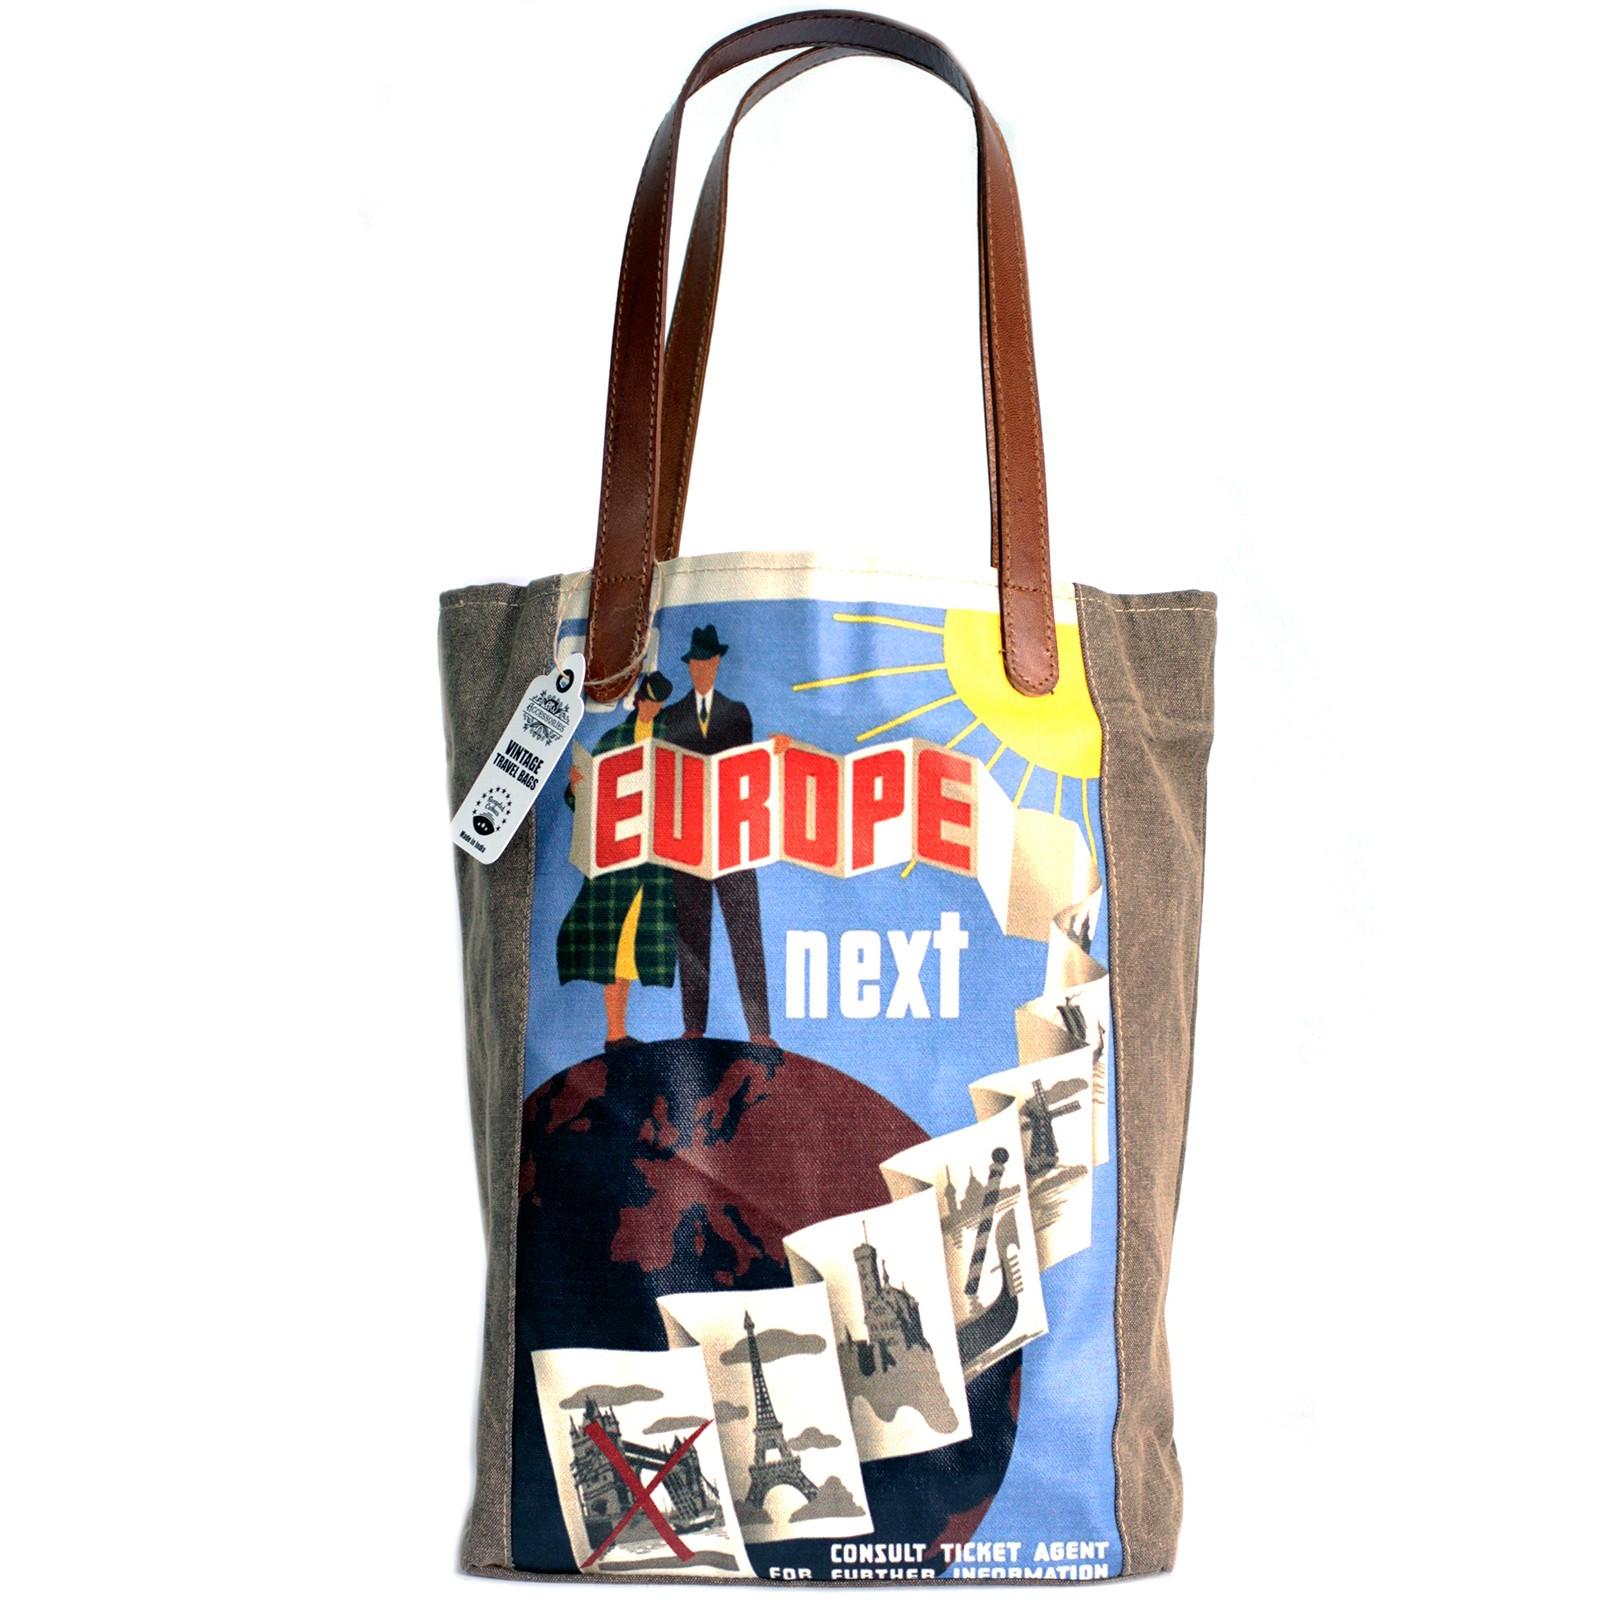 Vintage Travel Bag - Europe